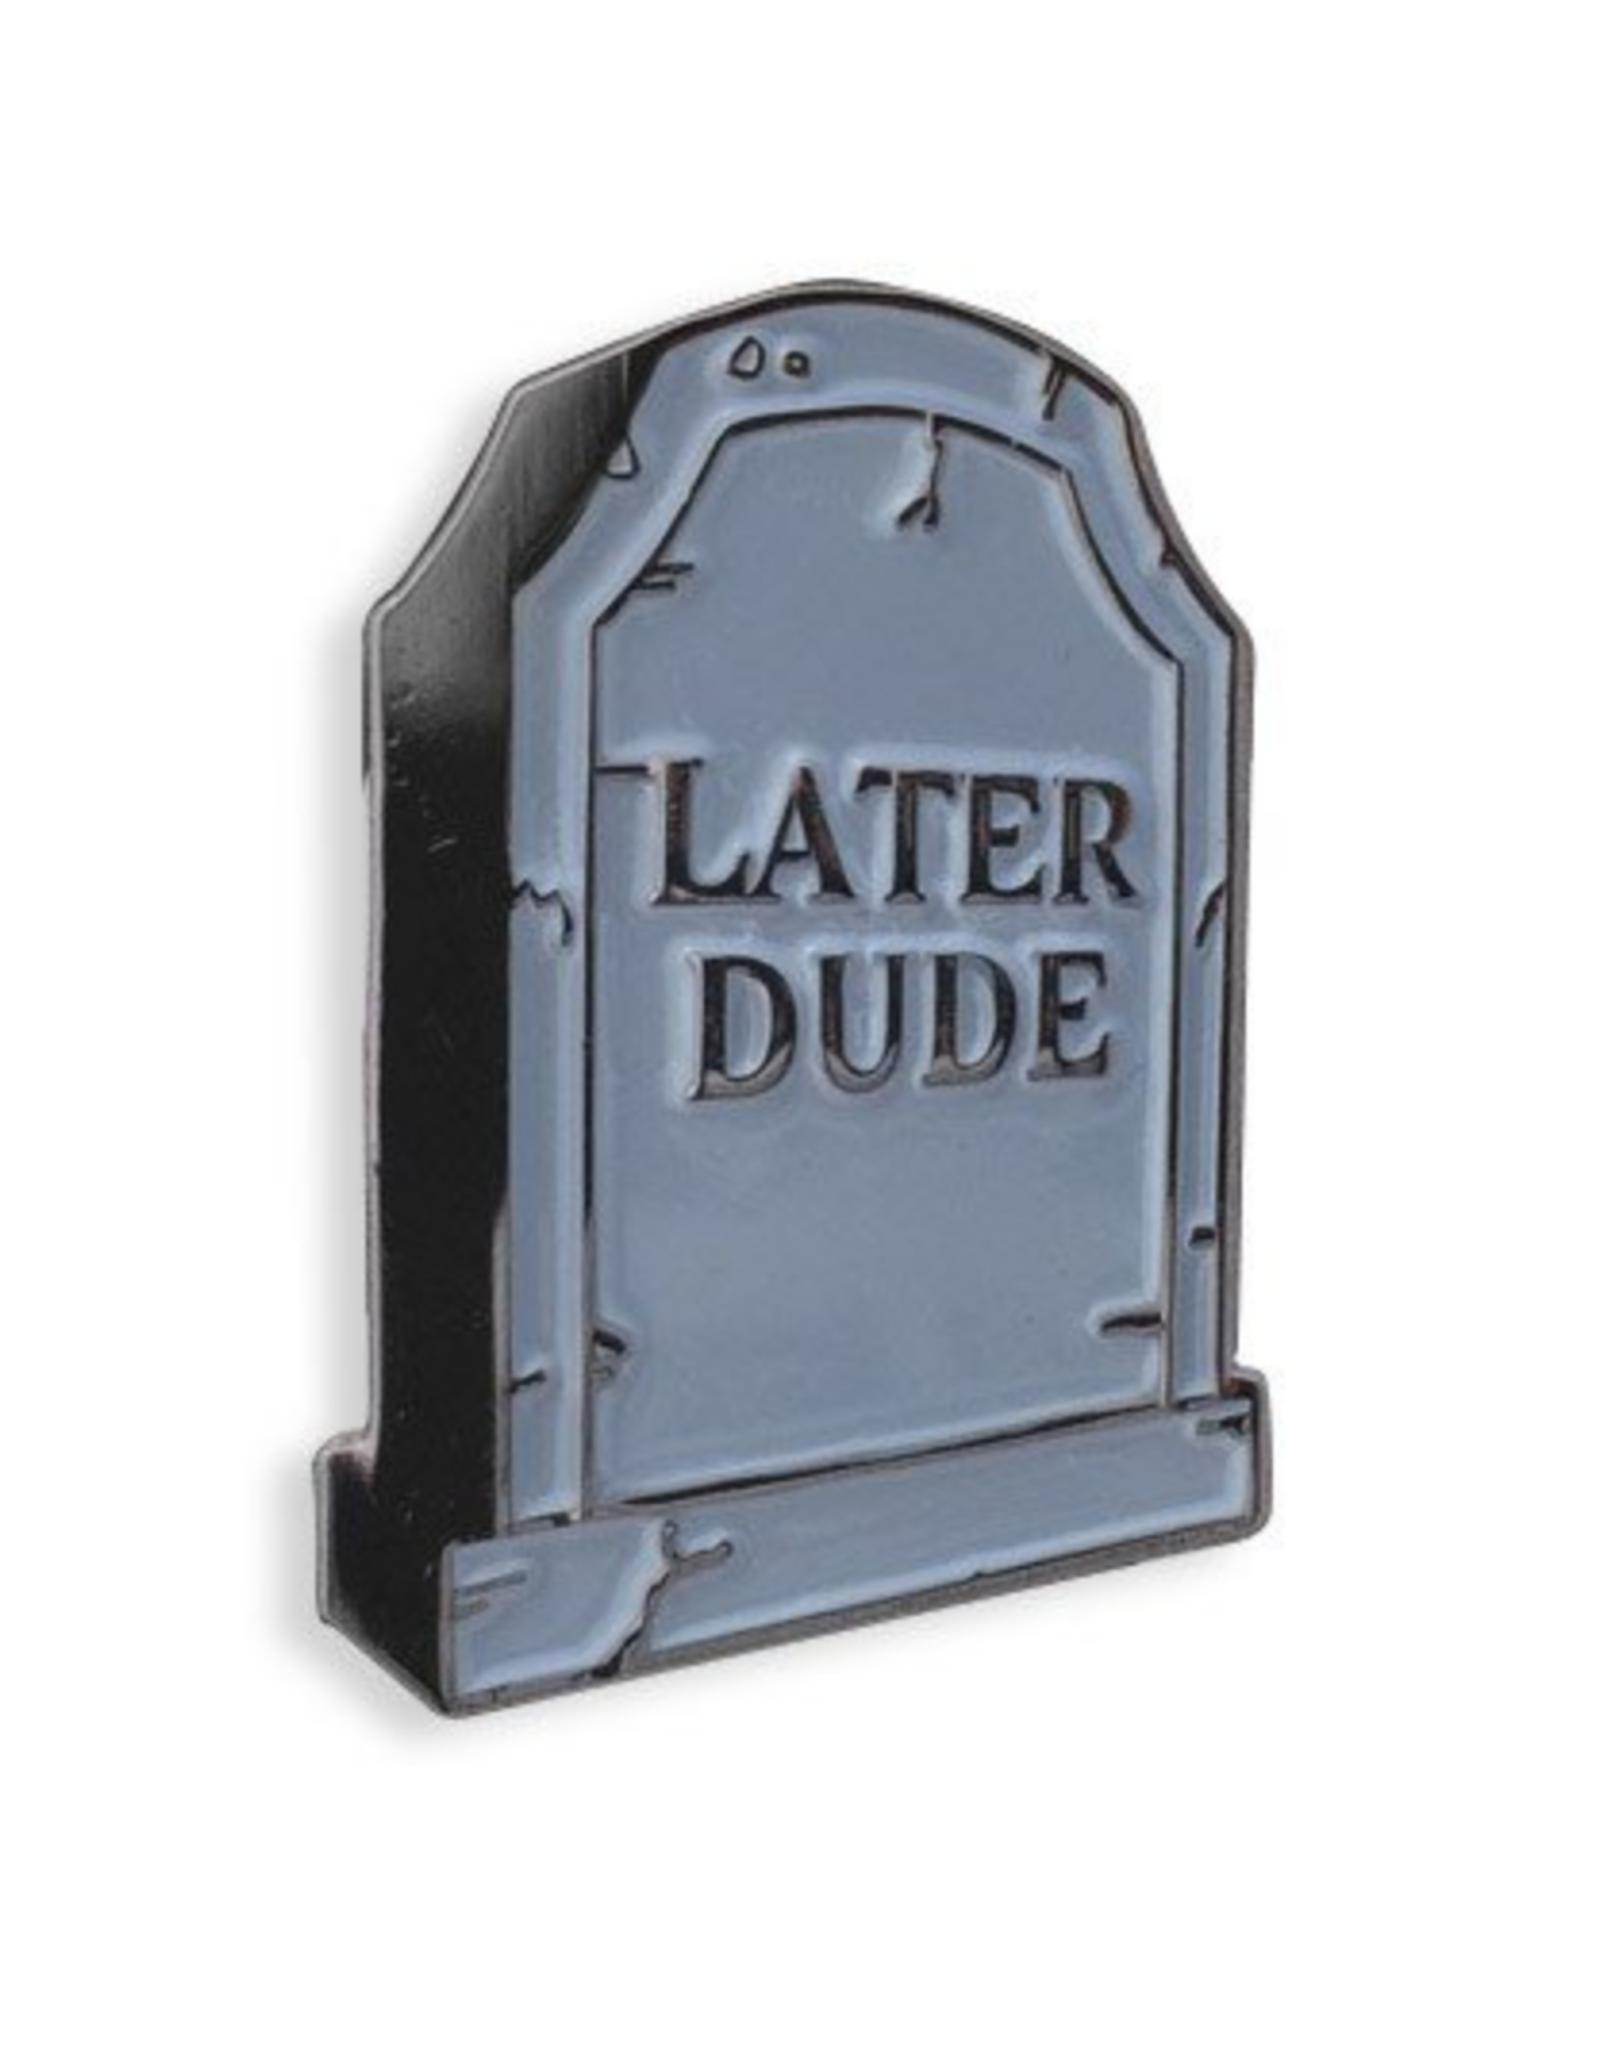 Later Dude Enamel Pin